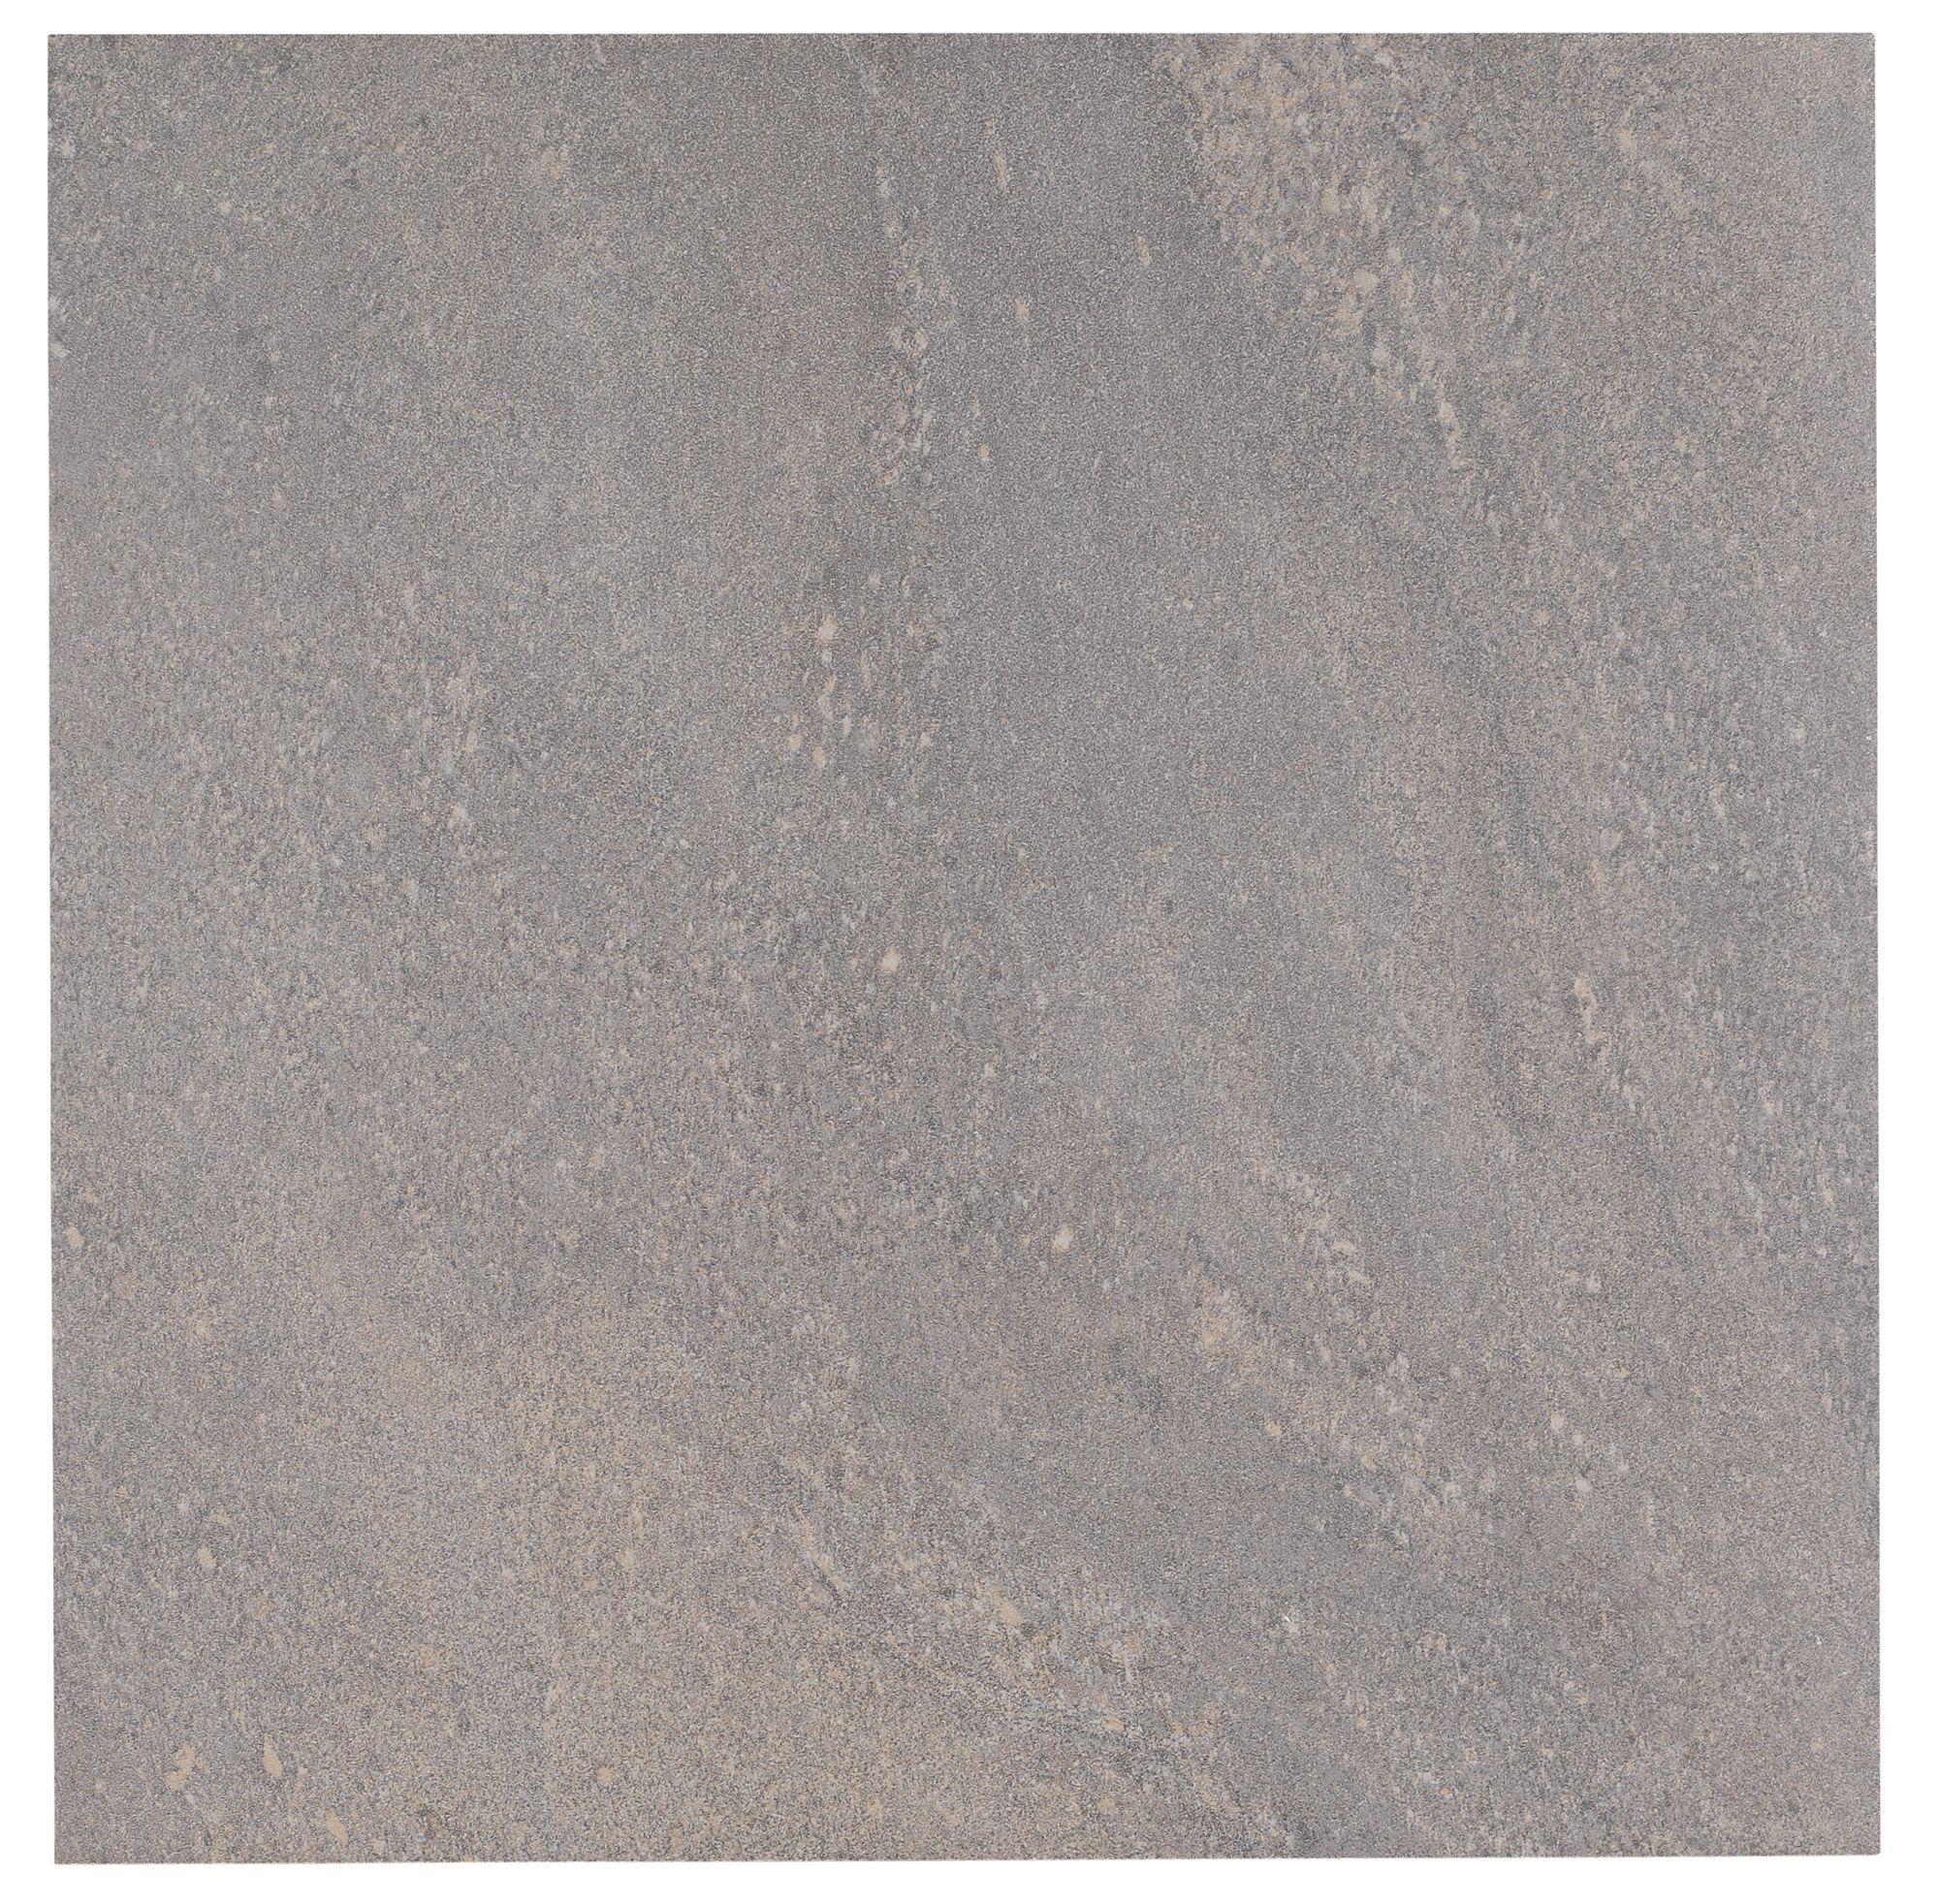 stone bathroom flooring texture. Antayla Grey Stone Effect Porcelain Floor Tile, Pack Of 3, (L)600mm (W)600mm Bathroom Flooring Texture I